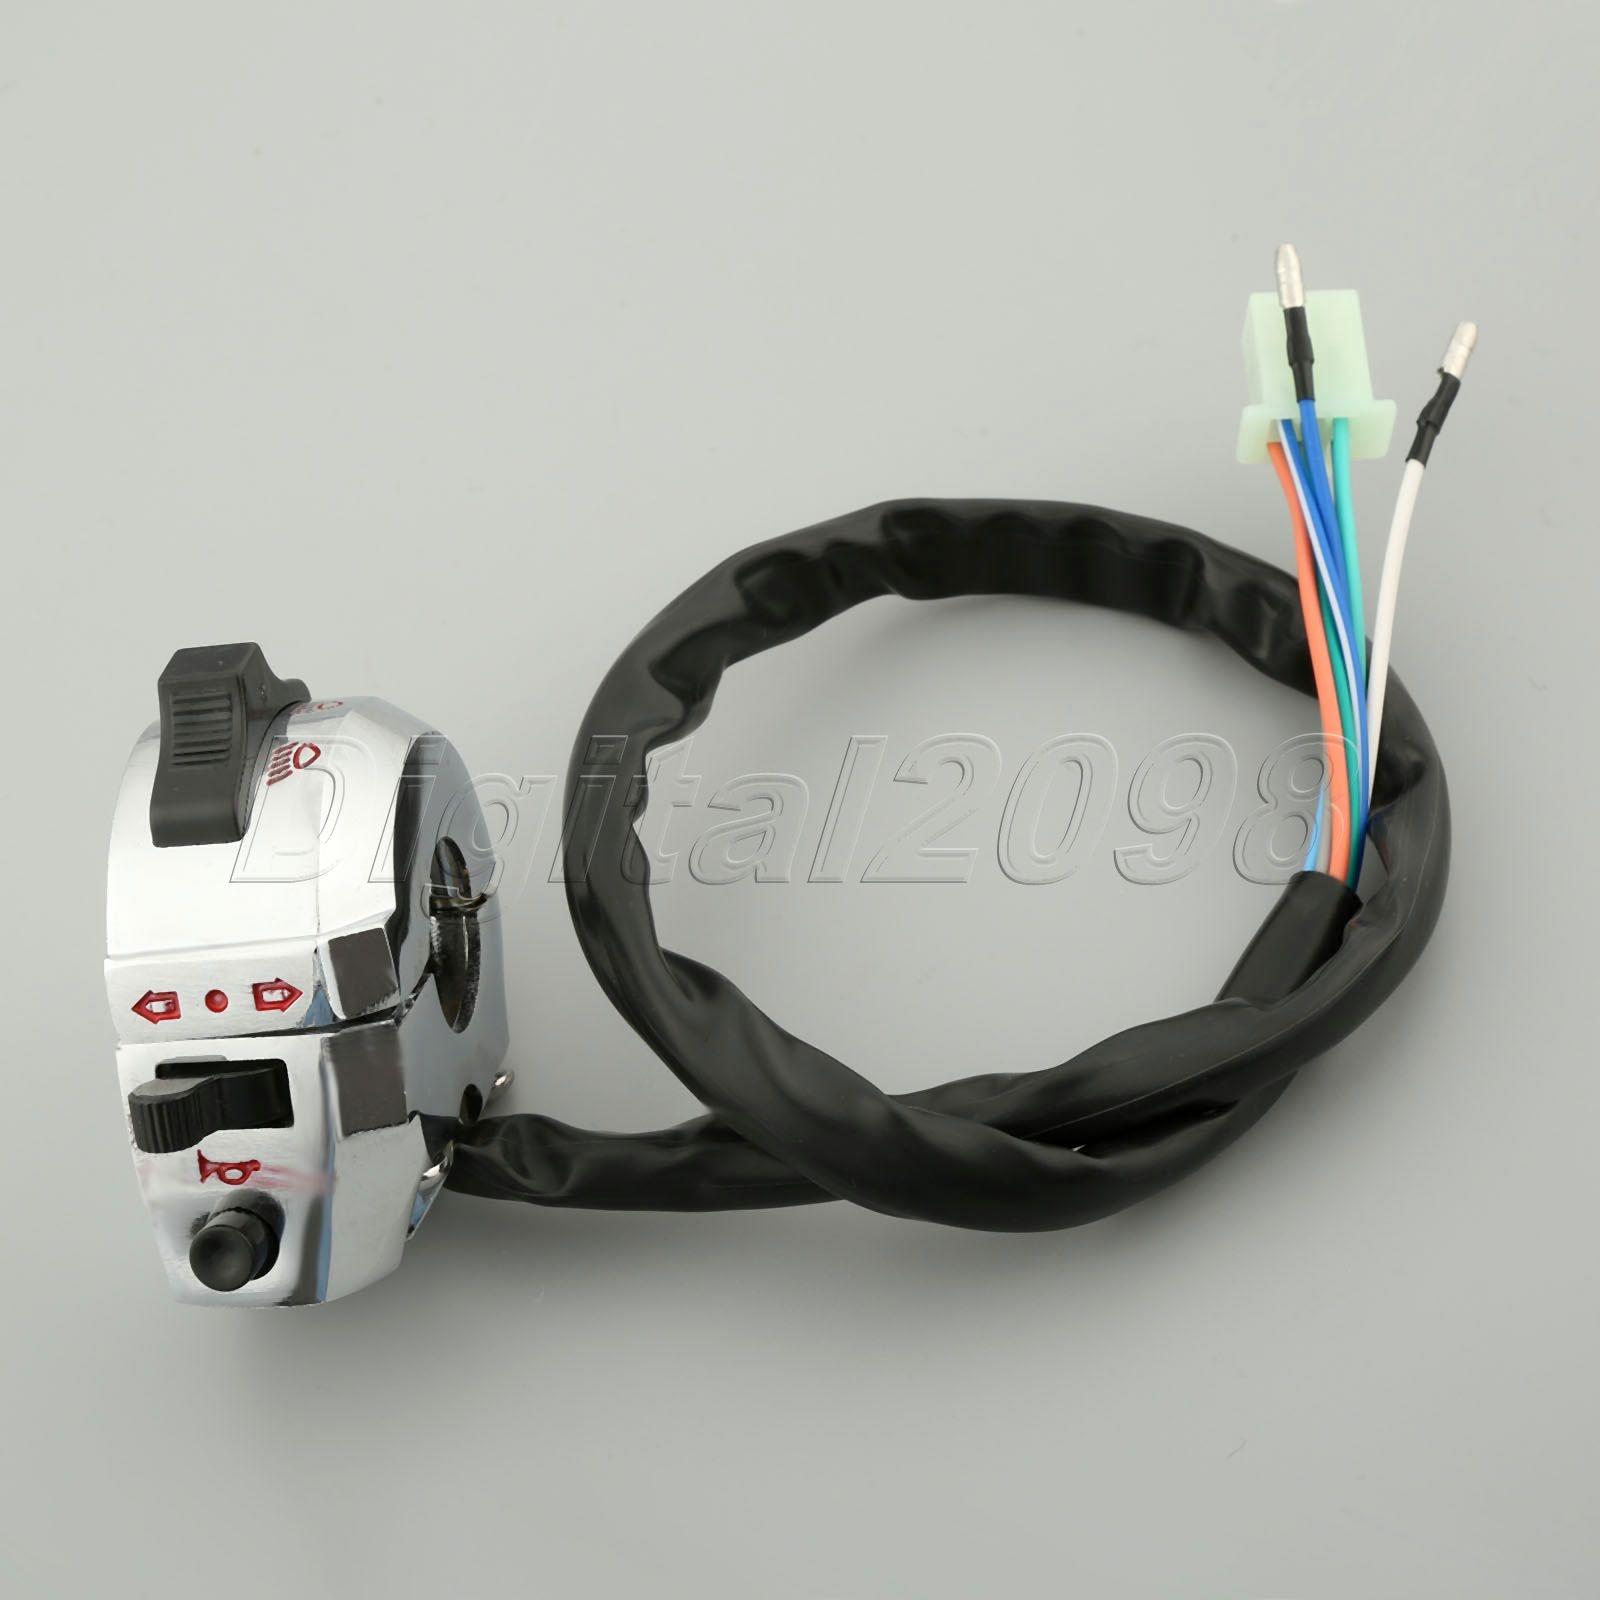 13 Draht Schalter Steuern Choke Hebel Für 110cc 125cc 150cc 200cc 250cc ATV Quad